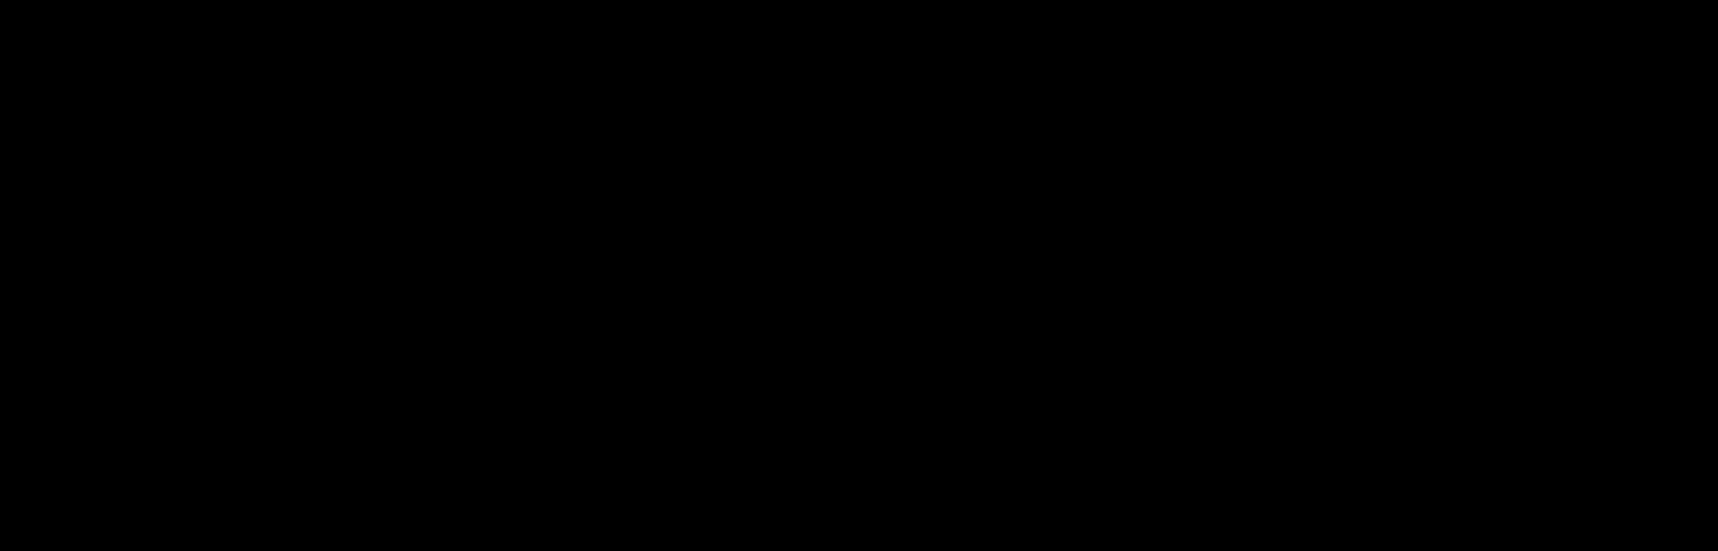 Hurt Capital Full Logo 2017 - Horizontal - Black.png